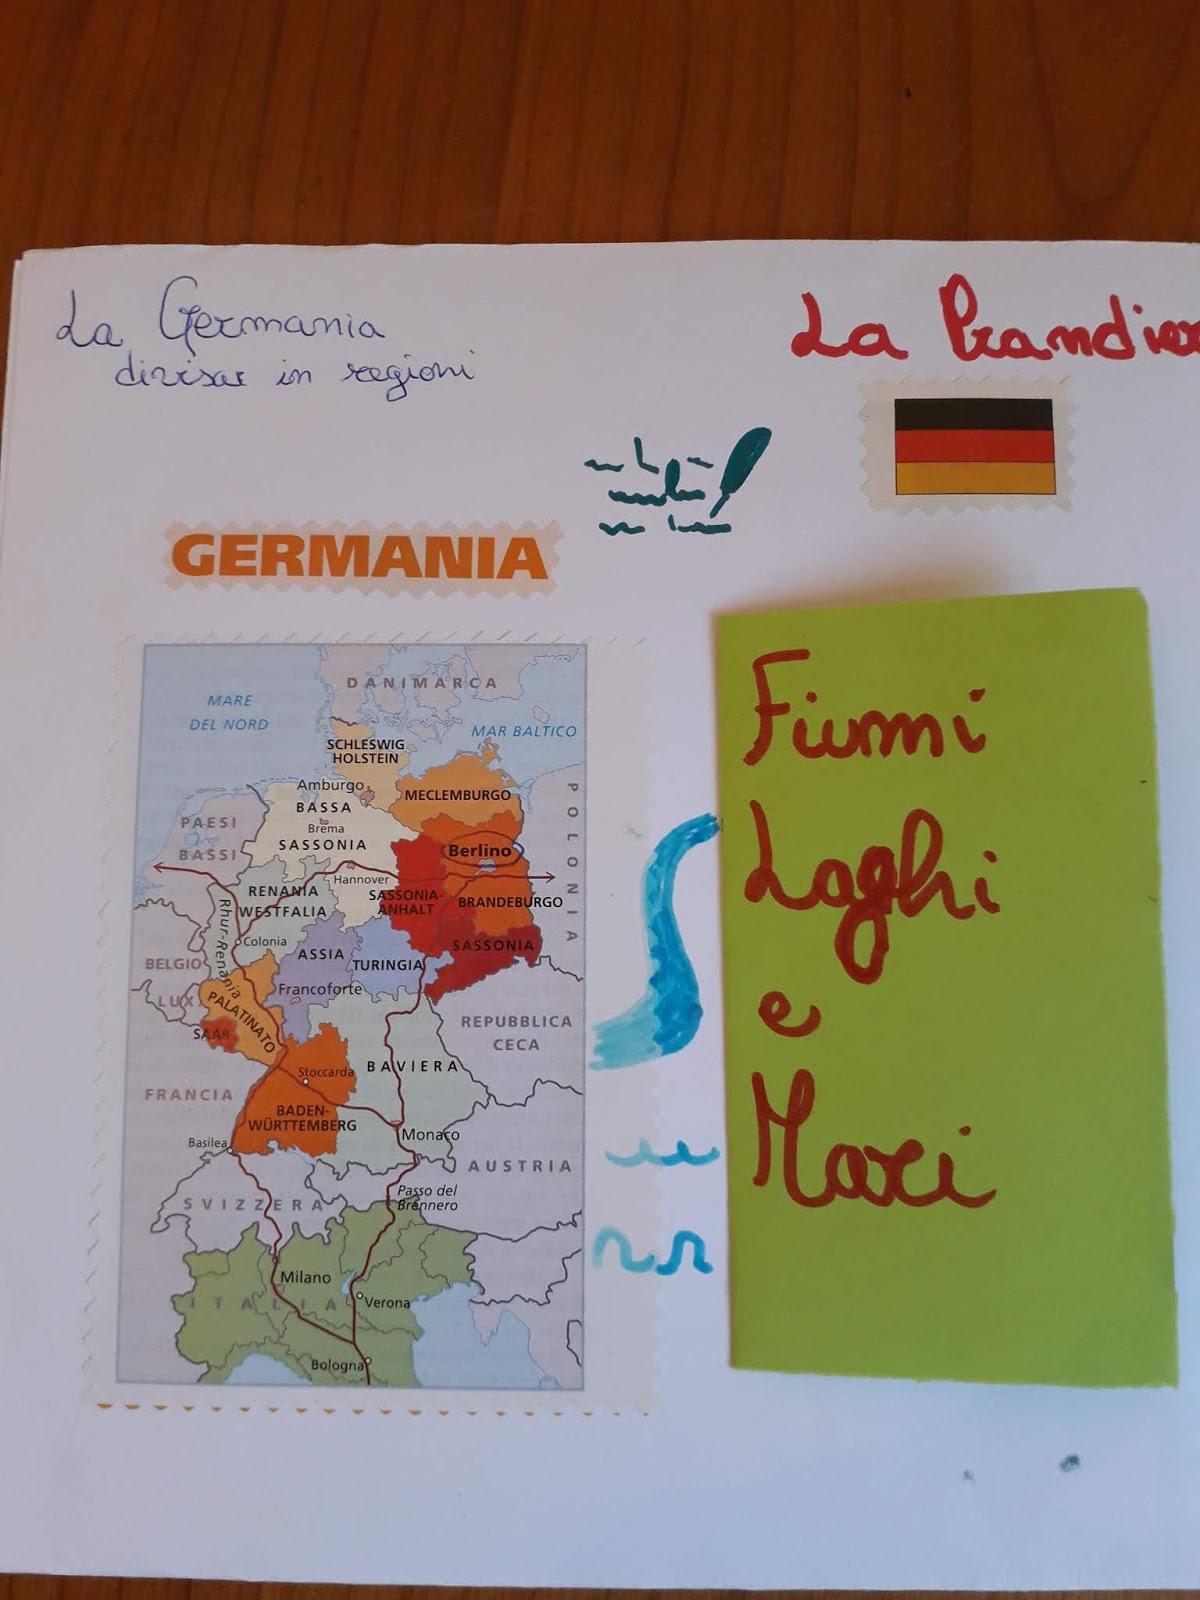 Germania Cartina Fiumi.Voceesilenzio Homeschooling Lapbook La Germania